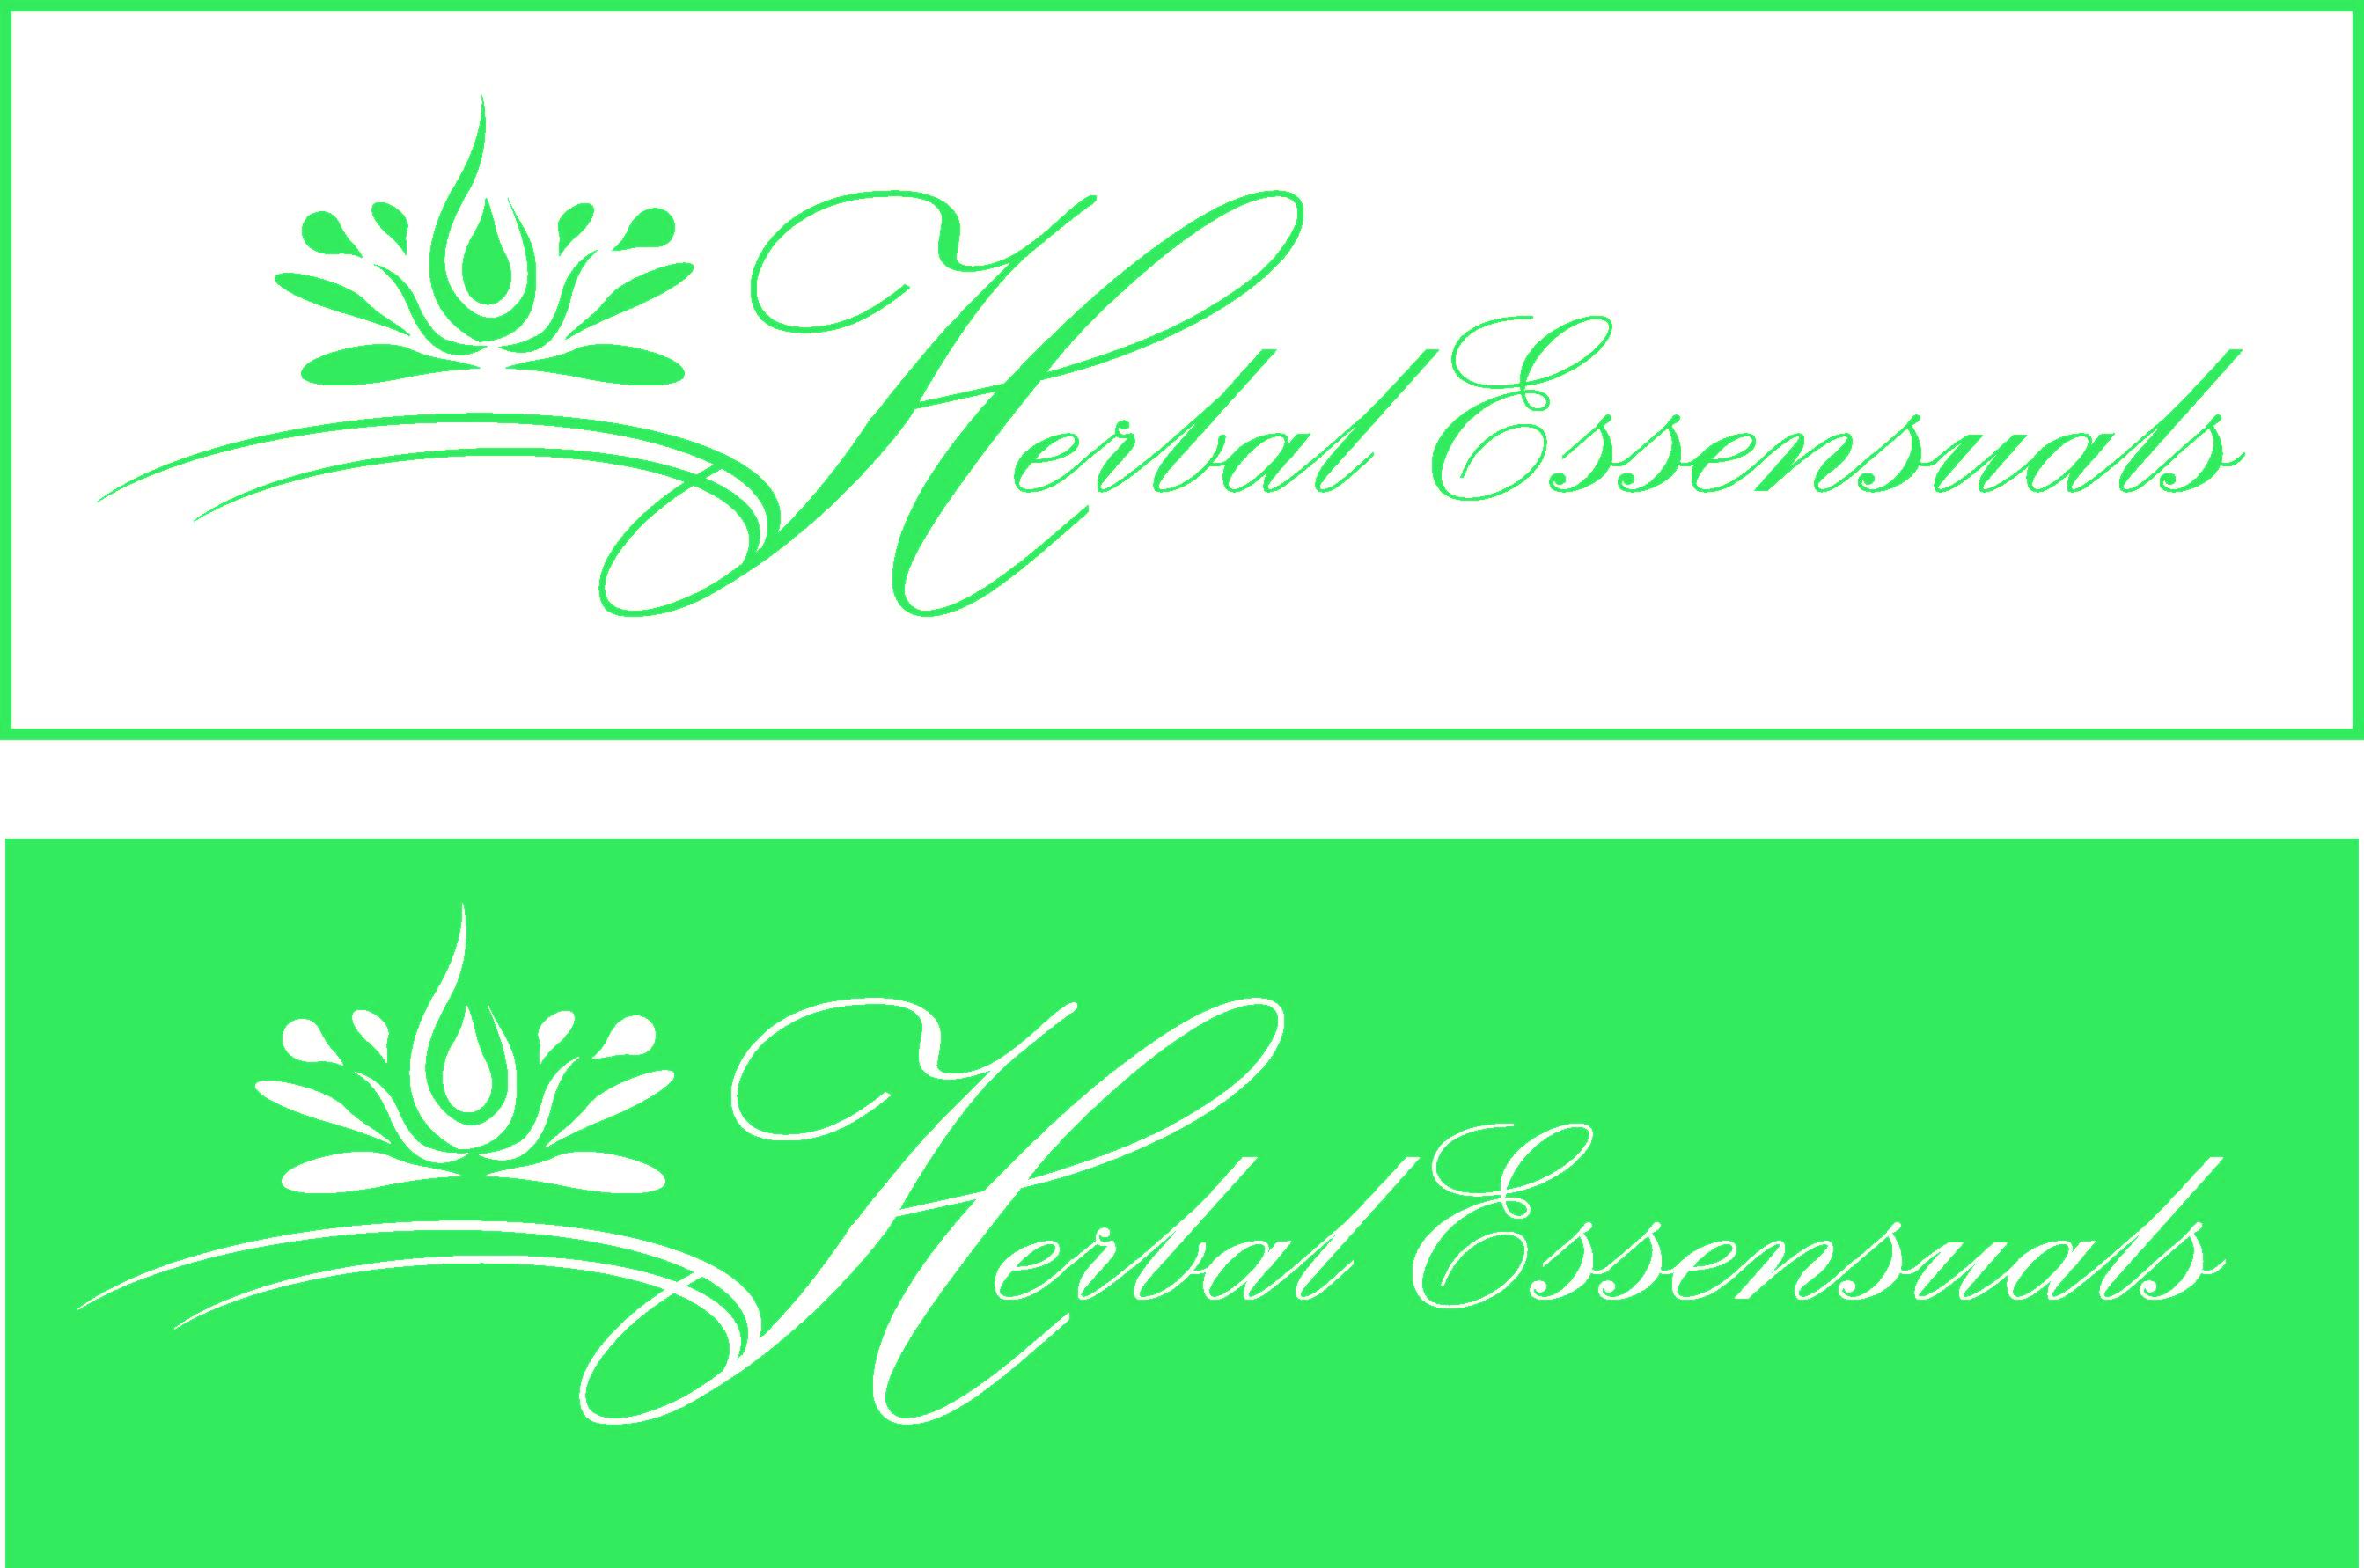 Logo Design by Laren Rabanal - Entry No. 18 in the Logo Design Contest Captivating Logo Design for Herbal Essensuals.